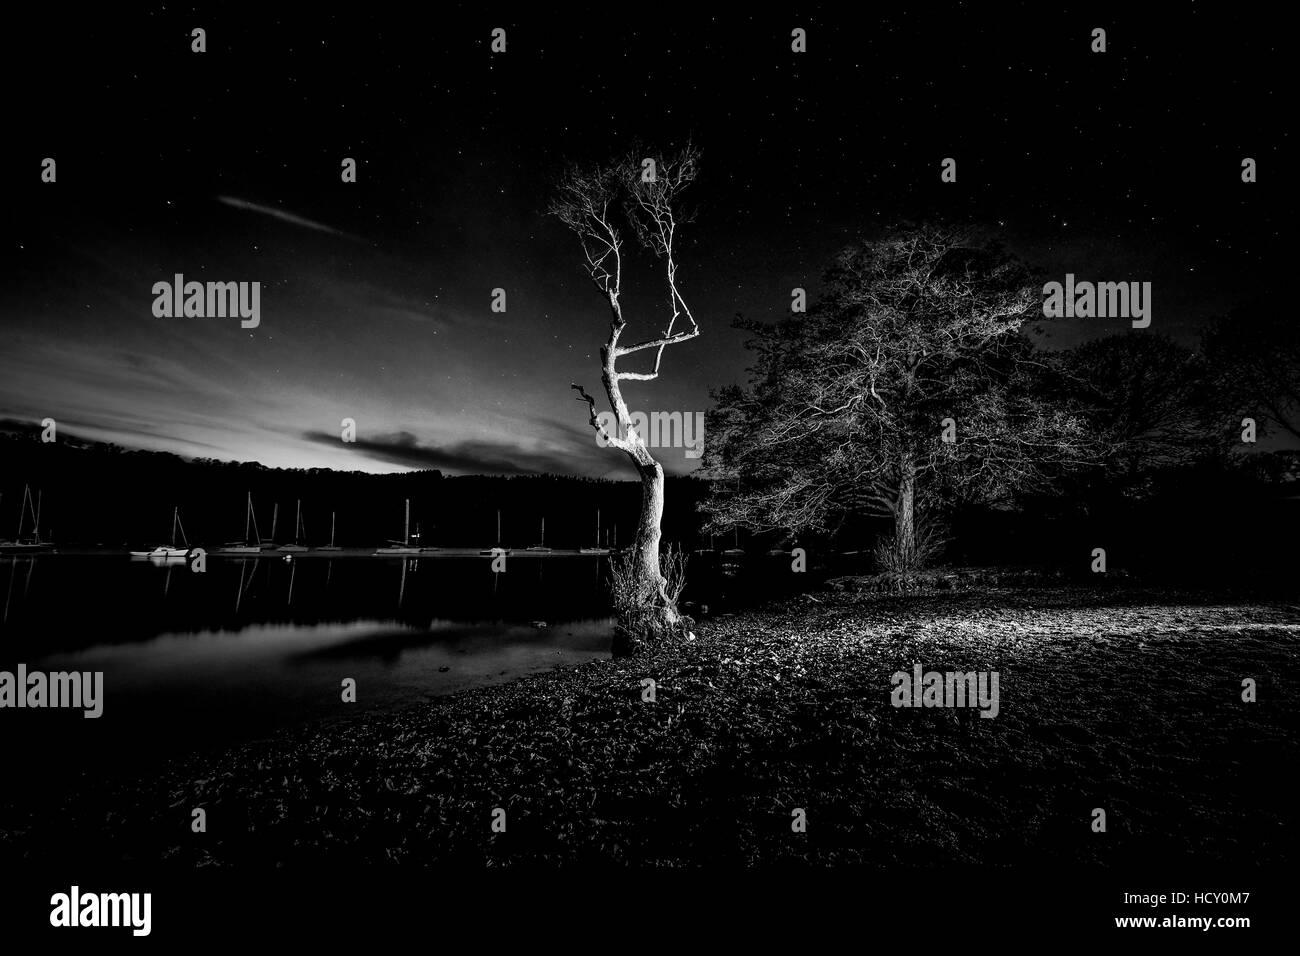 Tree at night on Lake Windermere - Stock Image